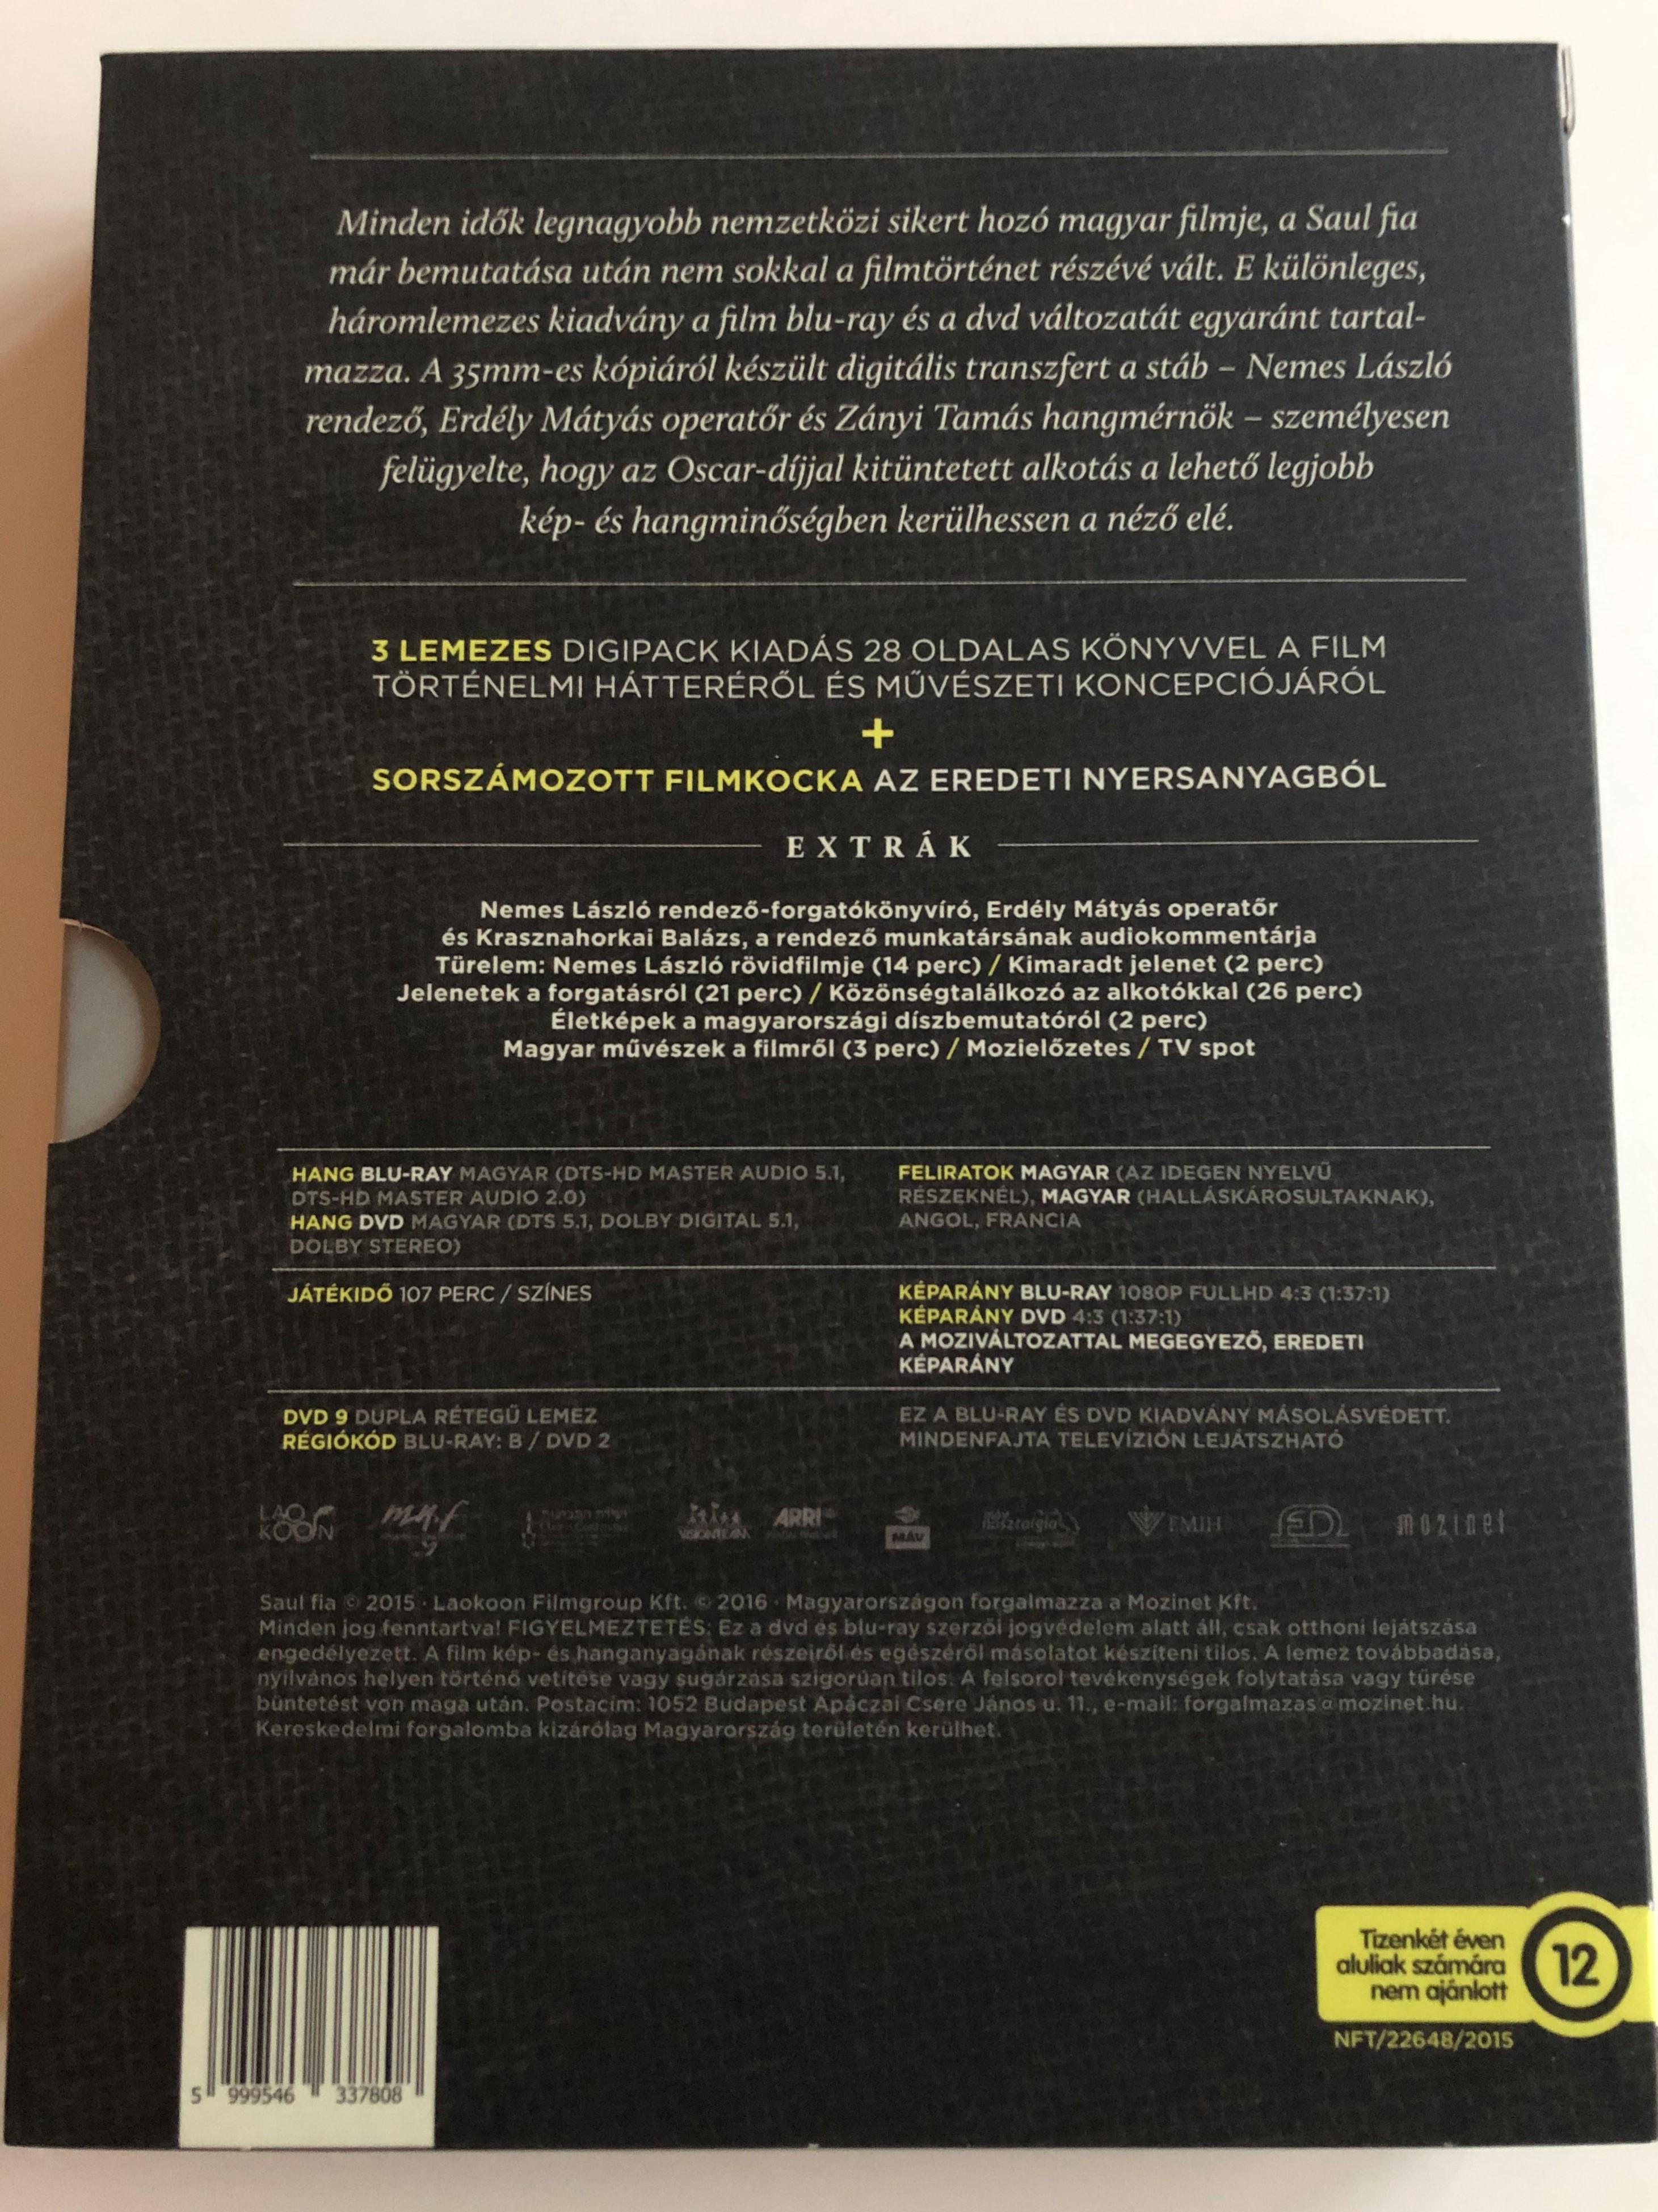 saul-fia-son-of-saul-bluray-dvd-2015-limited-edition-2.jpg